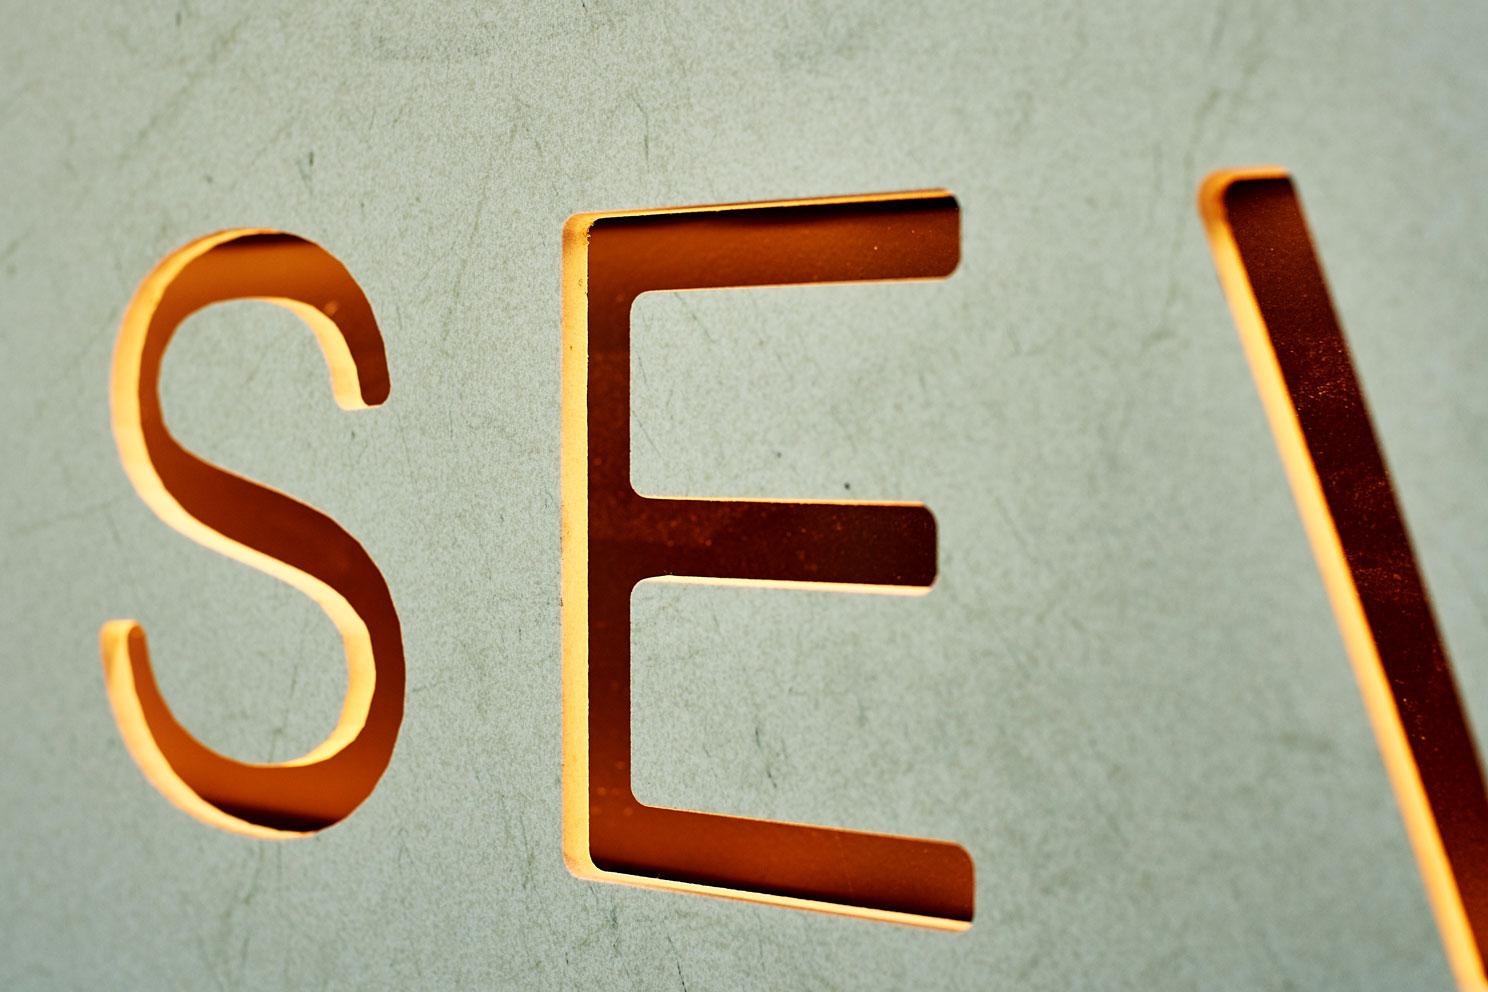 LD Sevilla  - cosentino 284 recurso letras DSC 0172 59